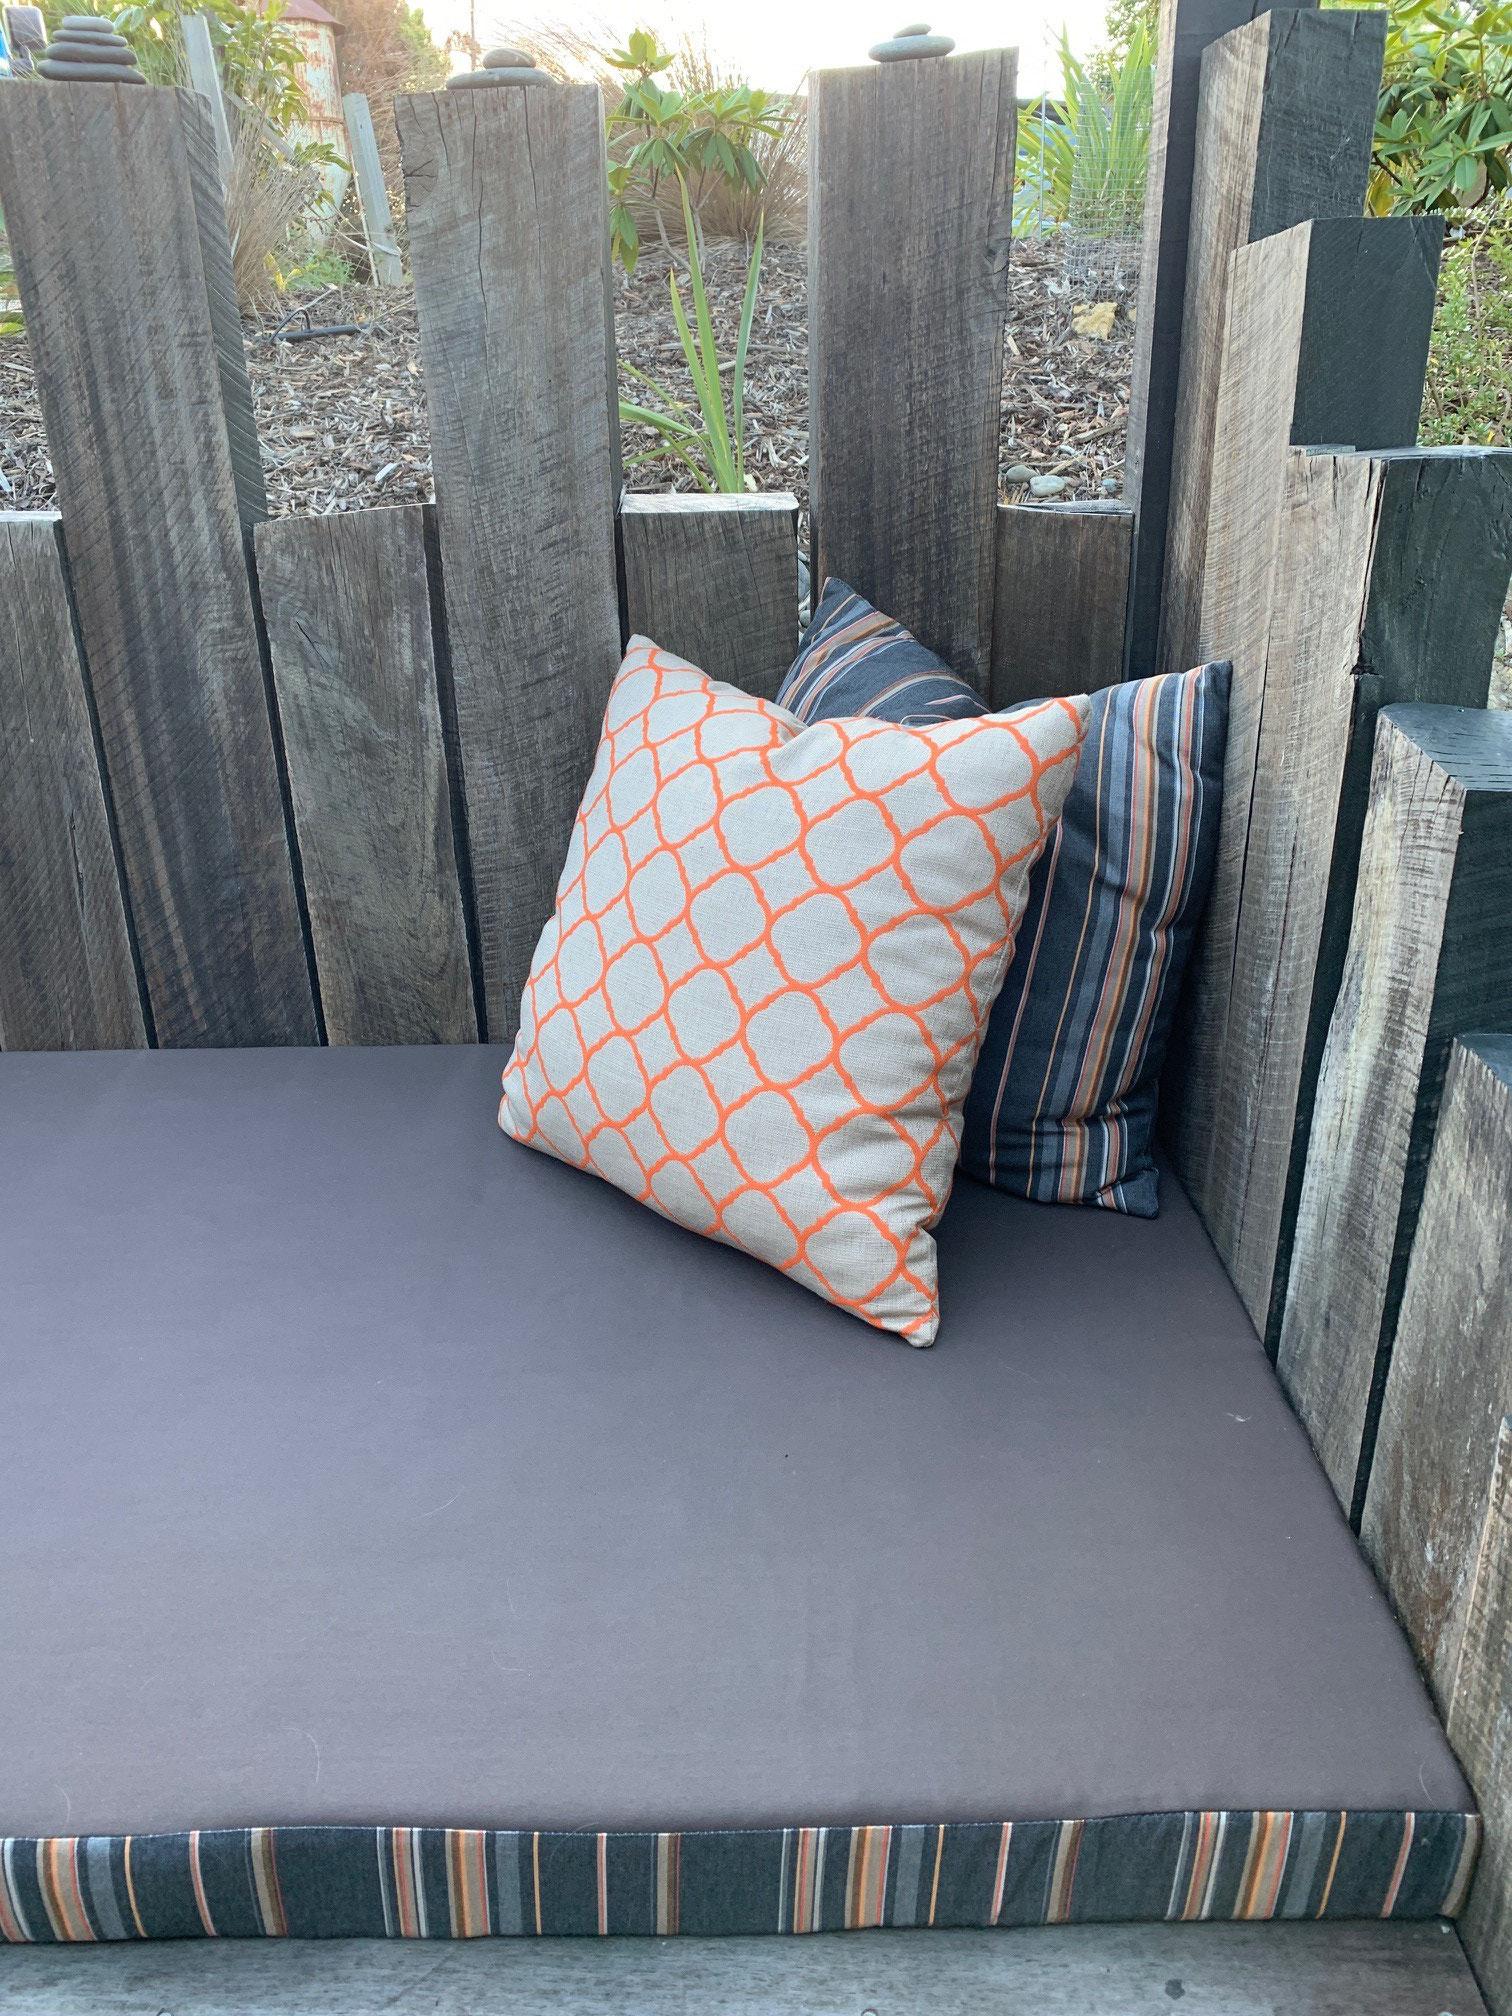 Sunbrella Outdoor Cushions & Mattress